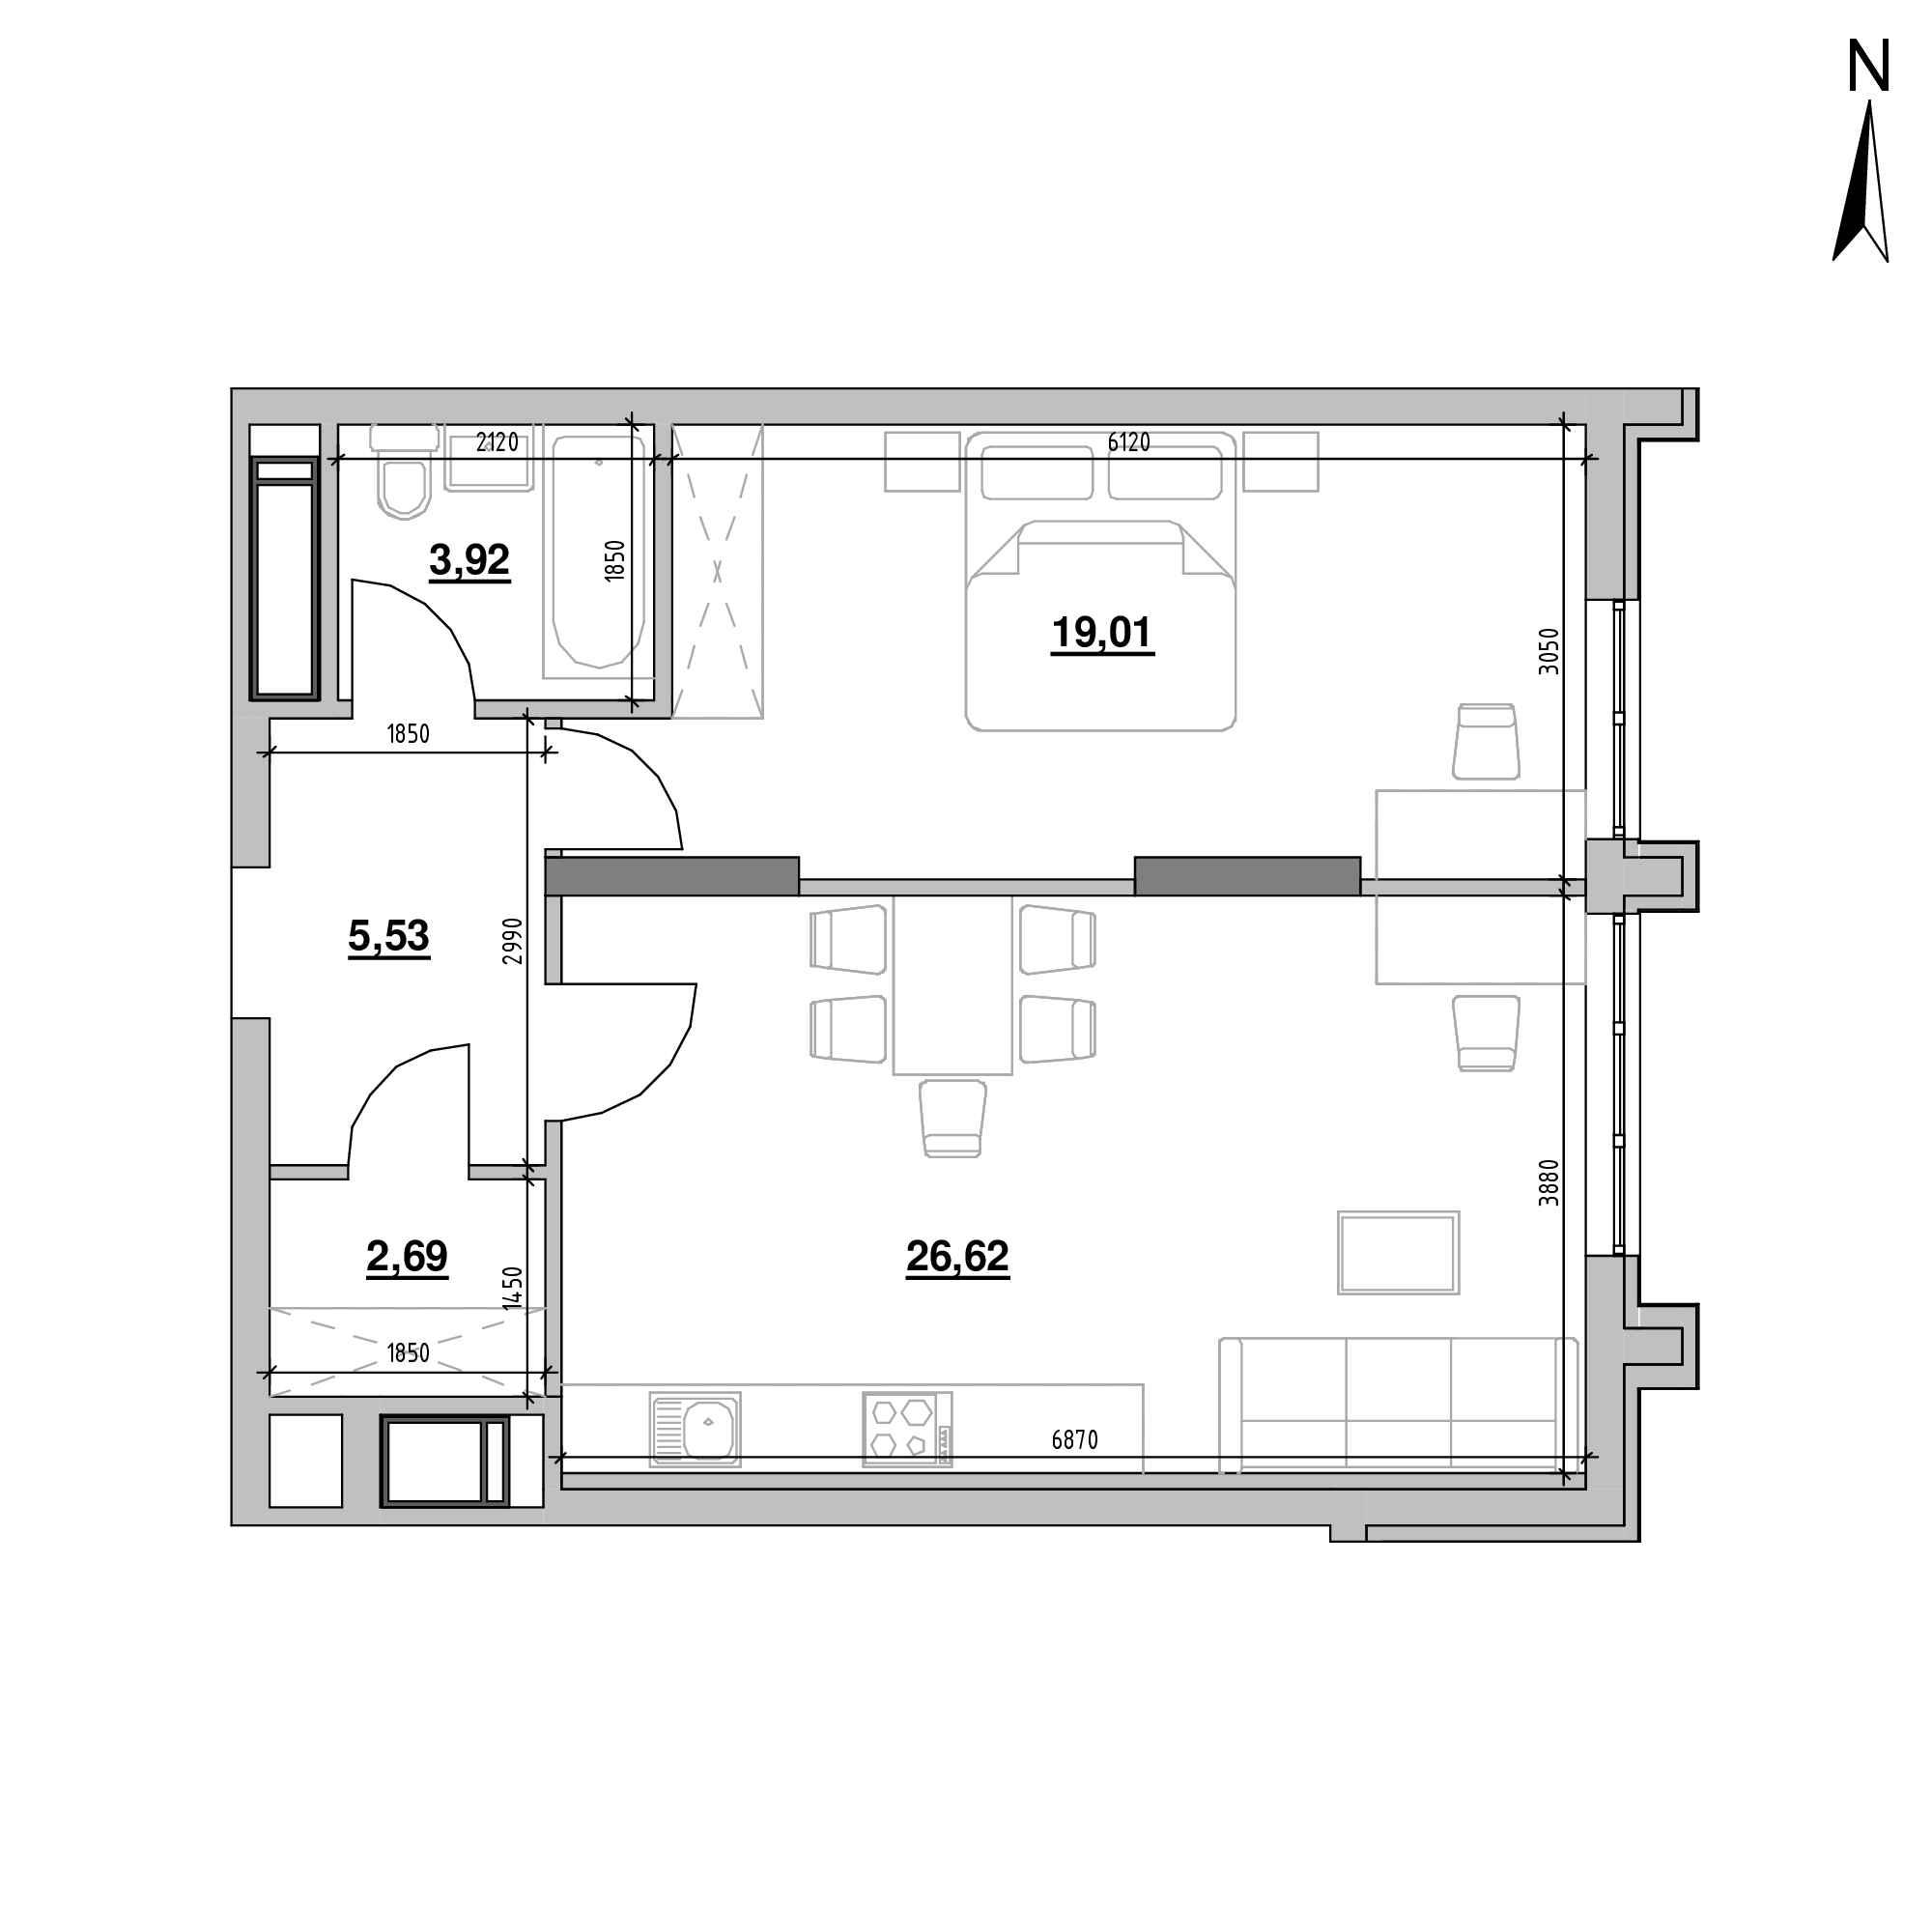 ЖК Nordica Residence: планування 1-кімнатної квартири, №180, 57.77 м<sup>2</sup>